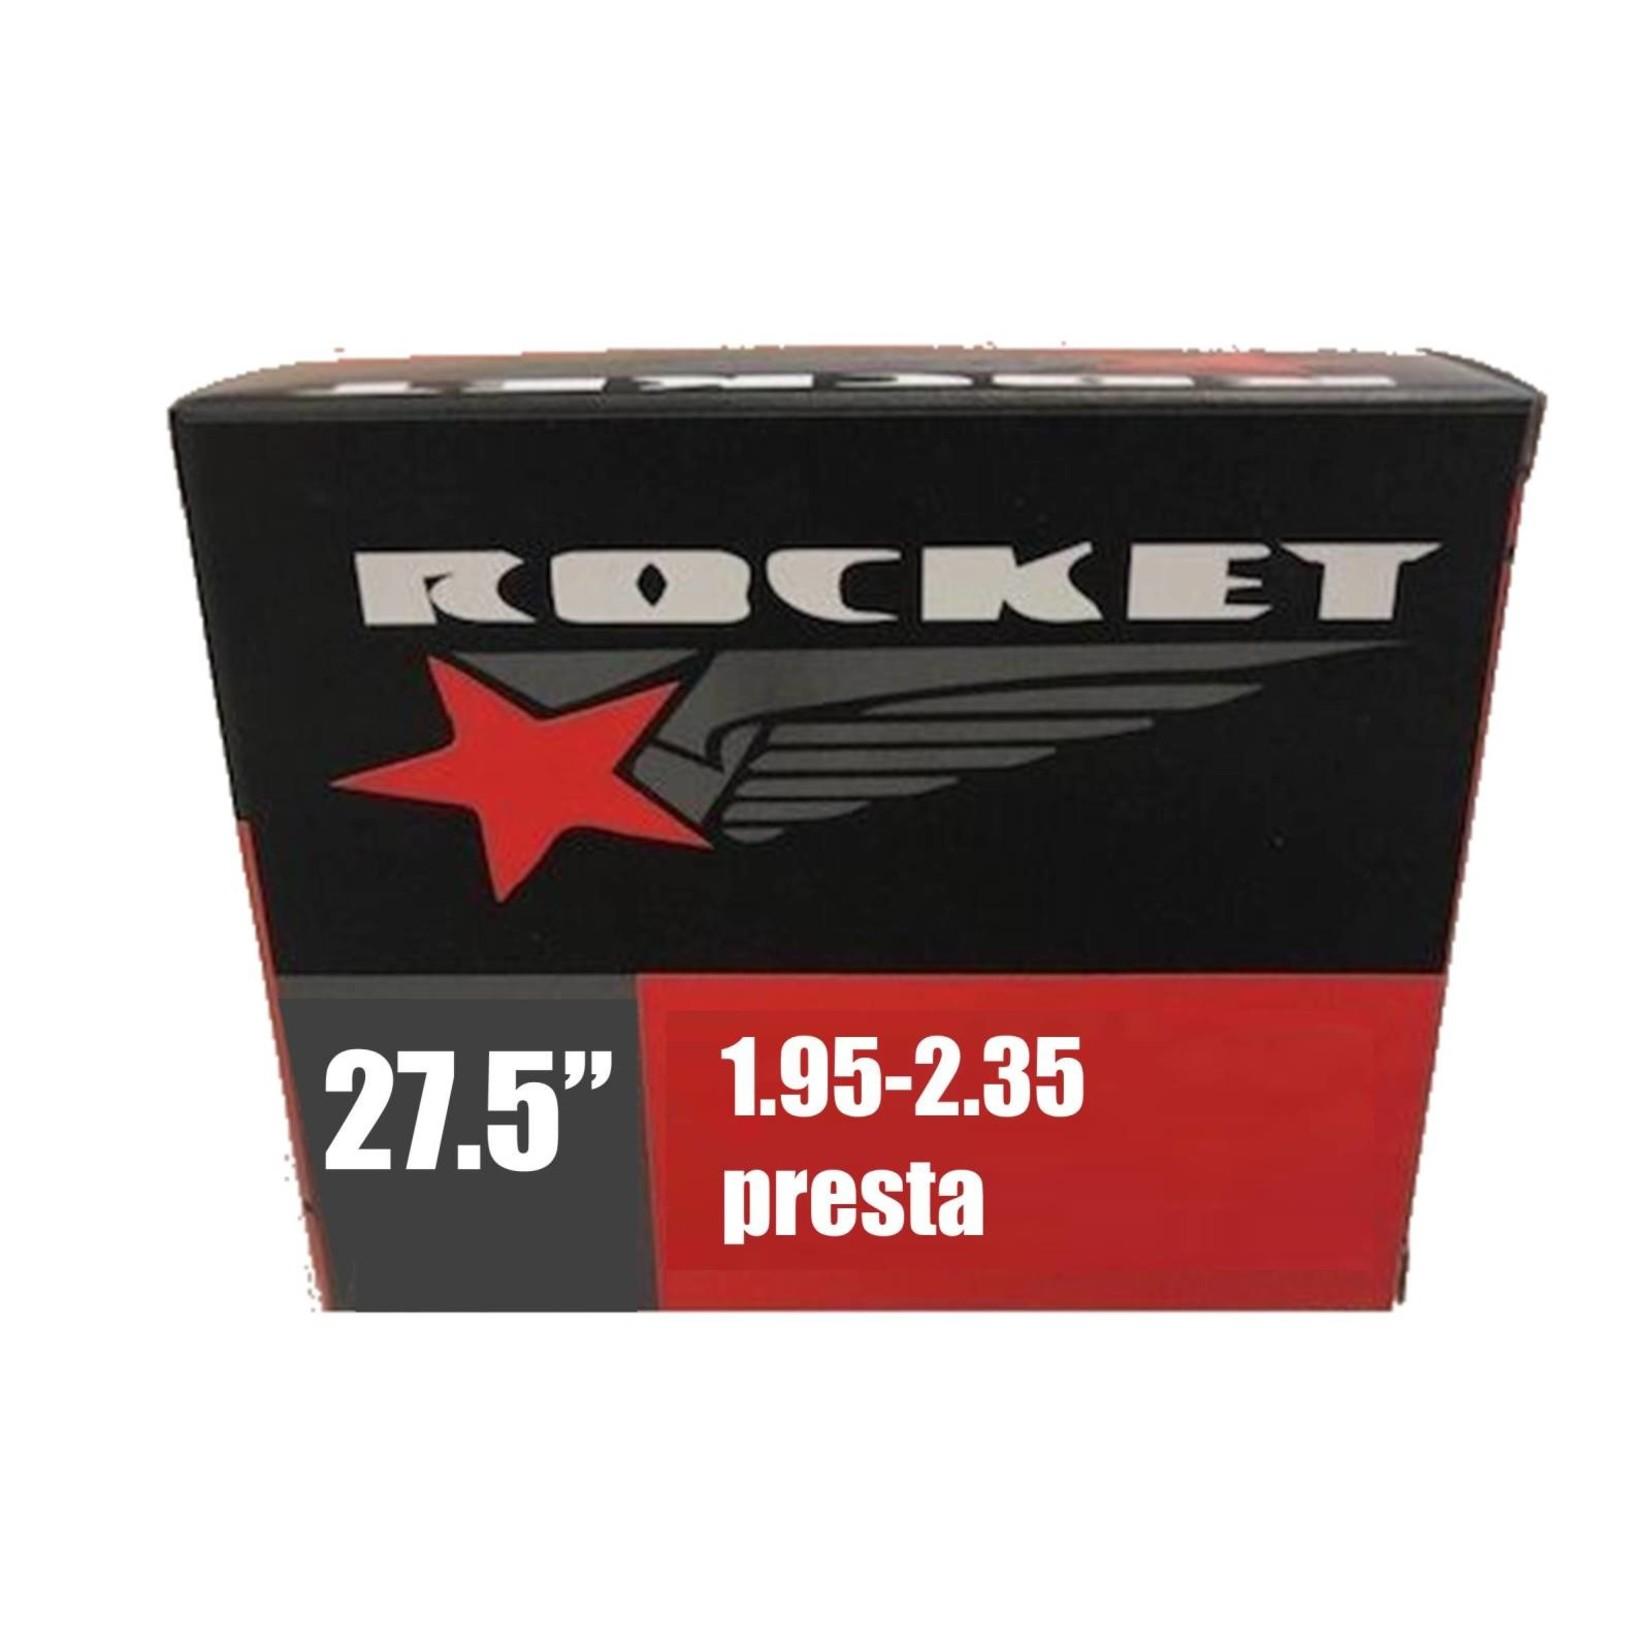 Rocket 27.5 x 1.95/2.35 Presta Tube